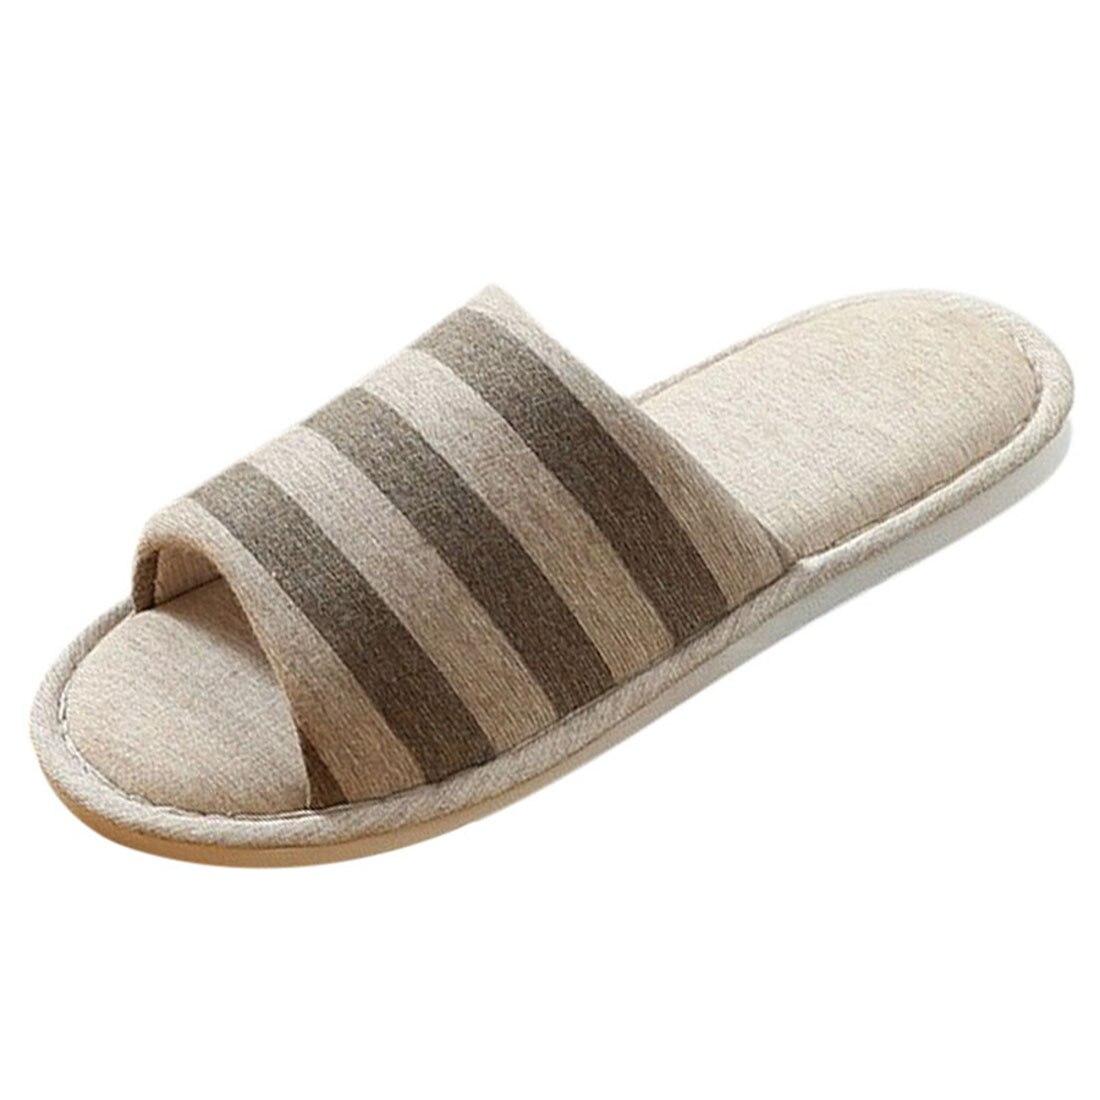 Men Autumn Home Slippers Men Indoor House Shoes Male Home Non-slip Slippers Male Shoes for Bedroom Men Casual House Slippers